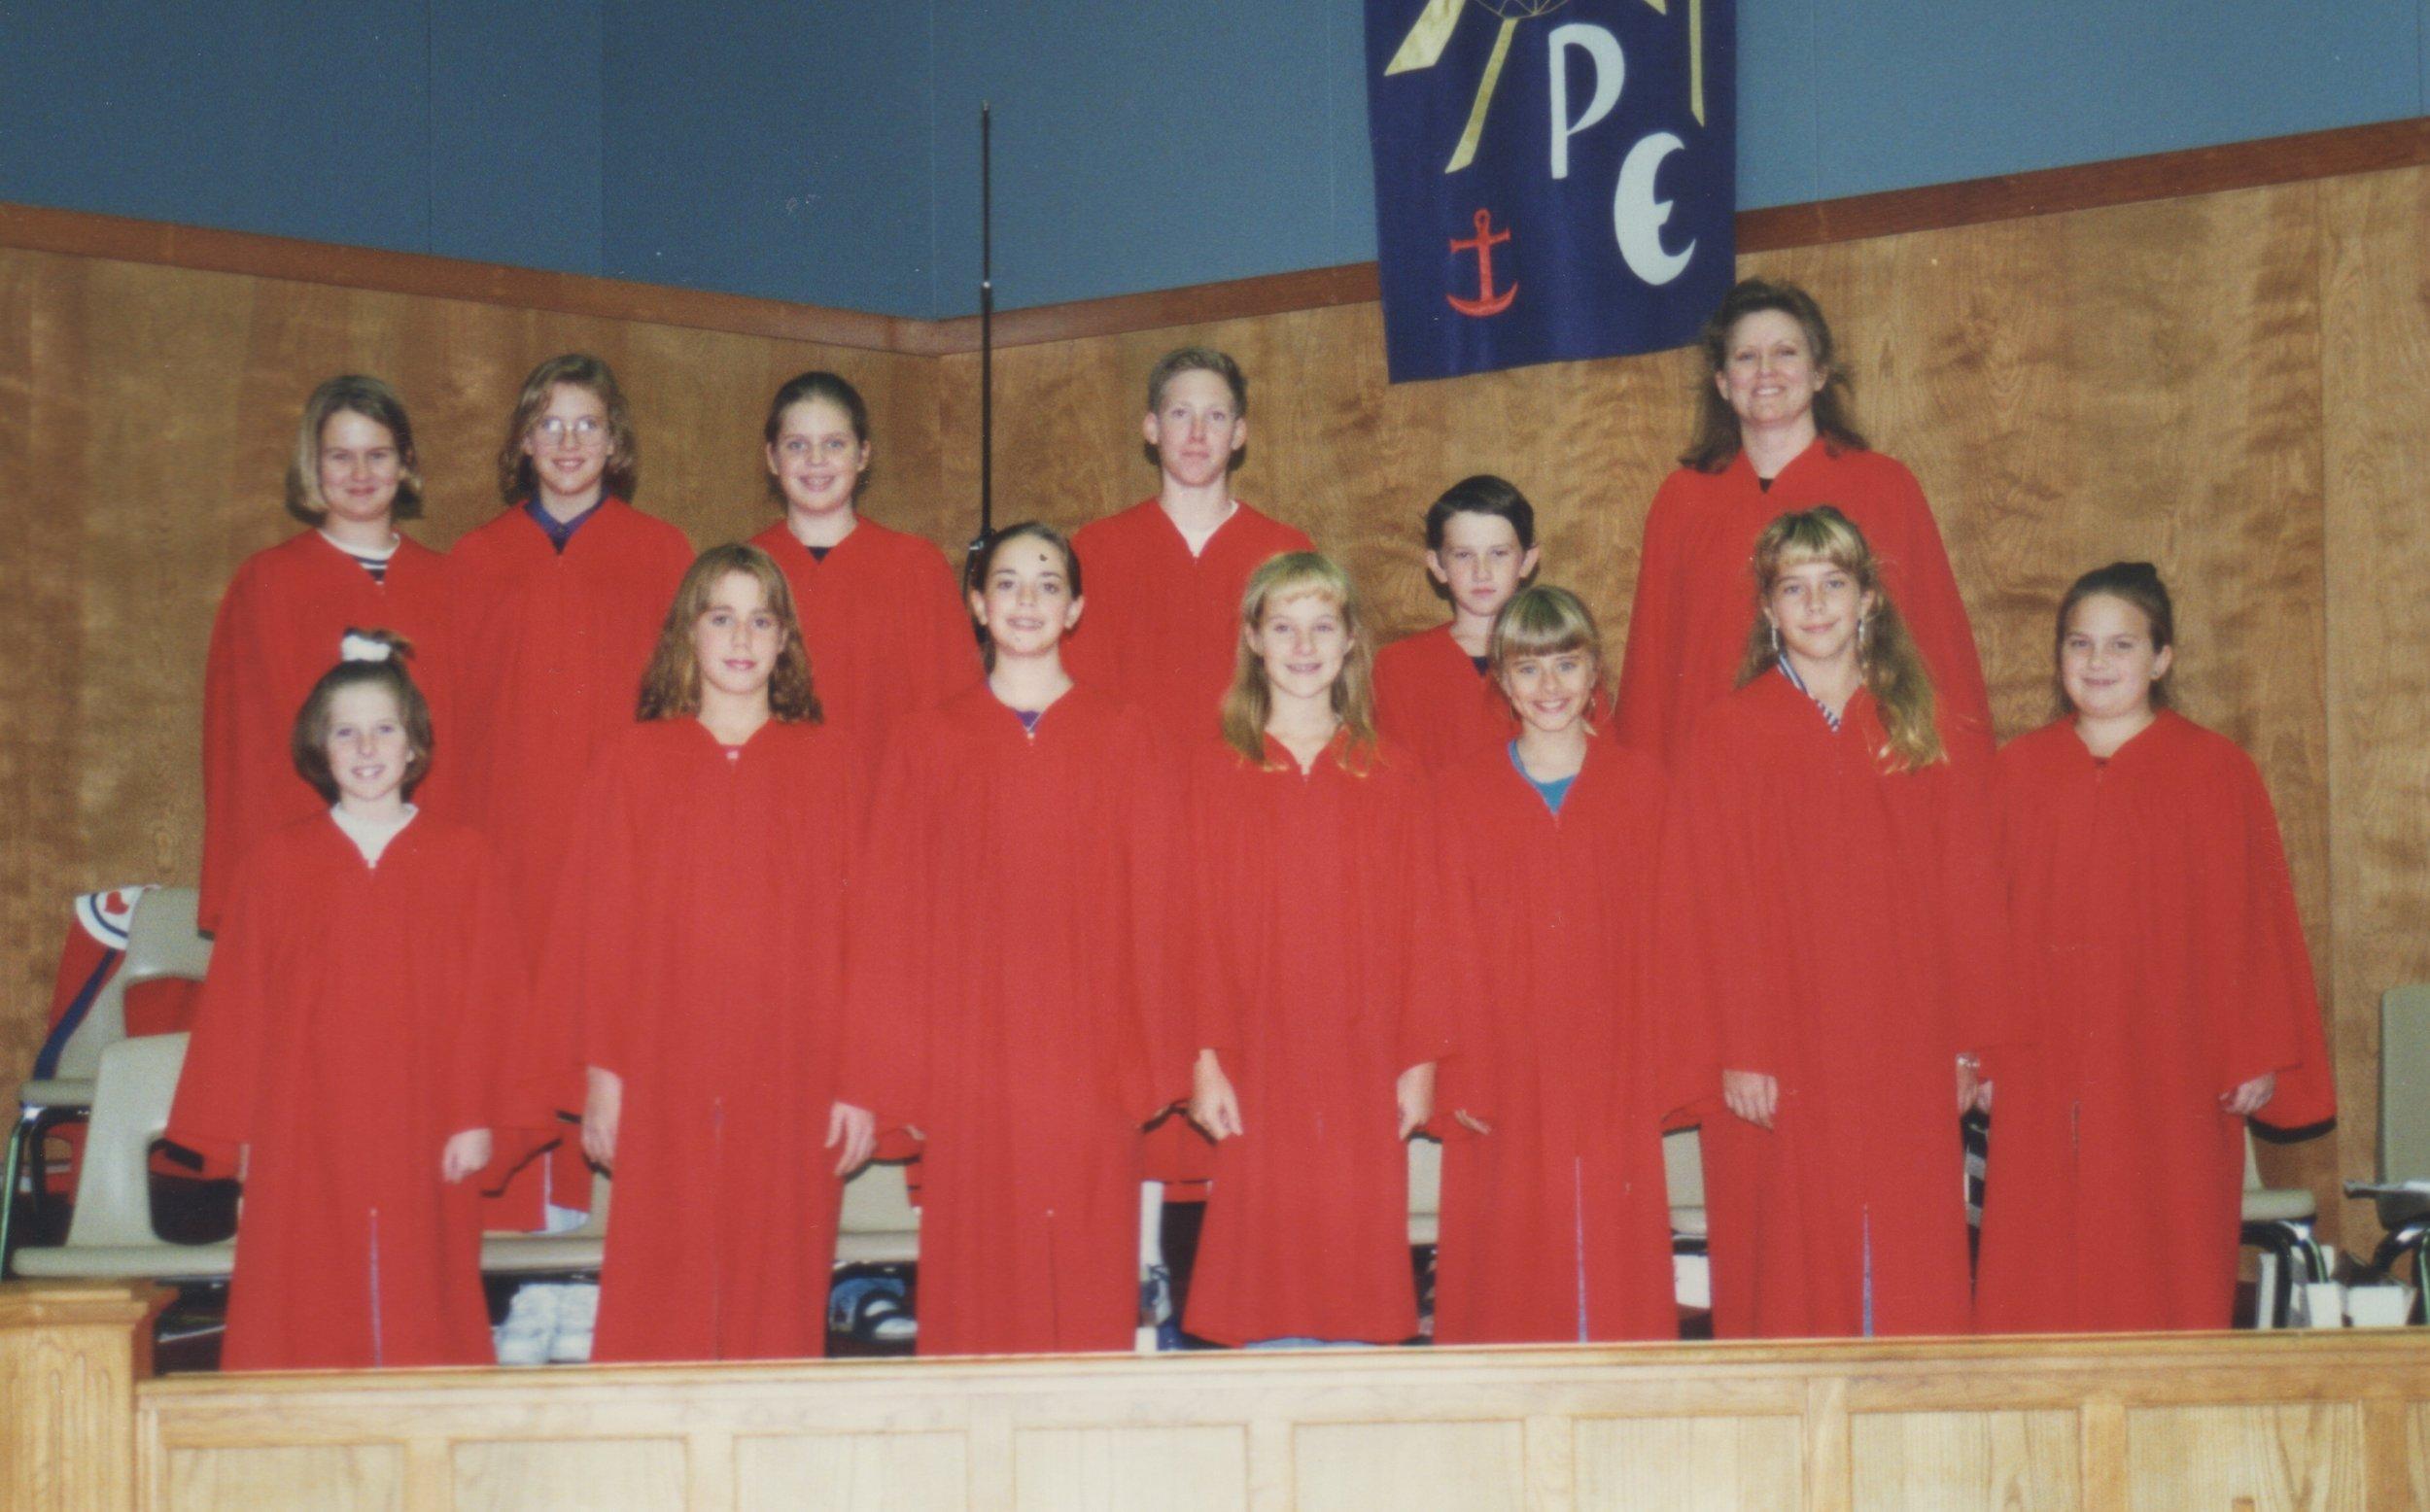 1991 Cmas Youth Choir.jpeg